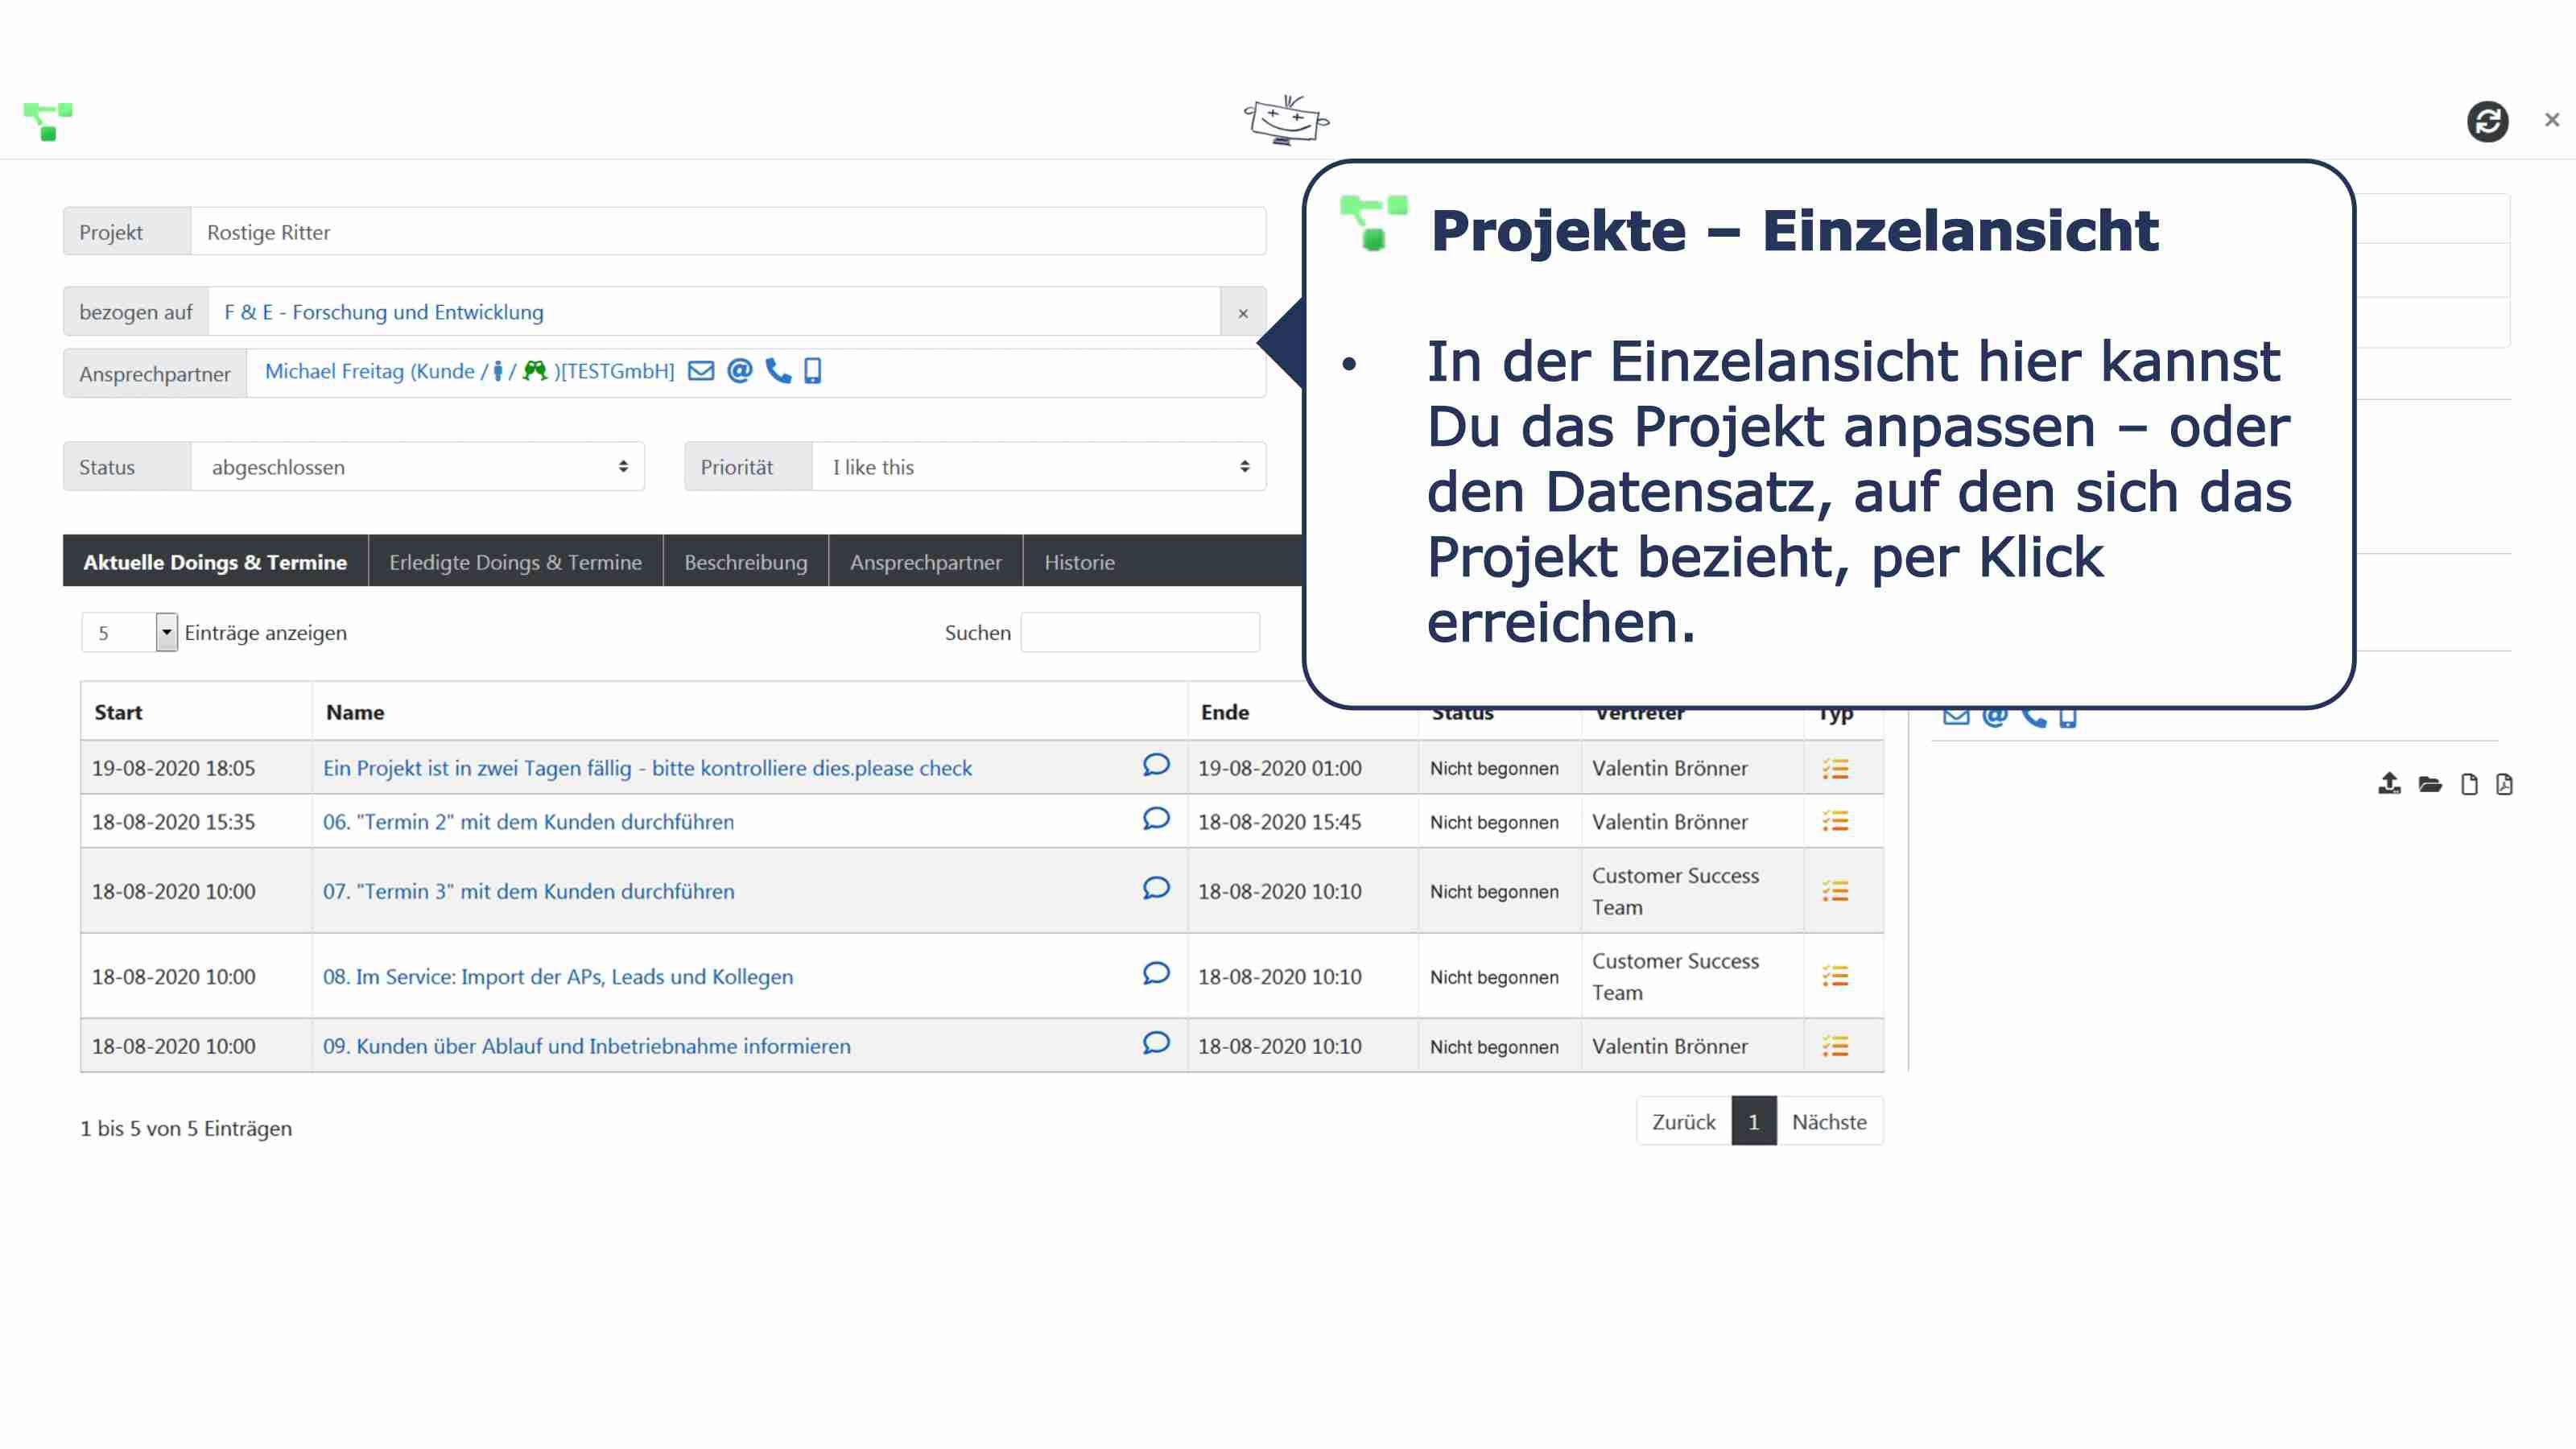 Projekte Details